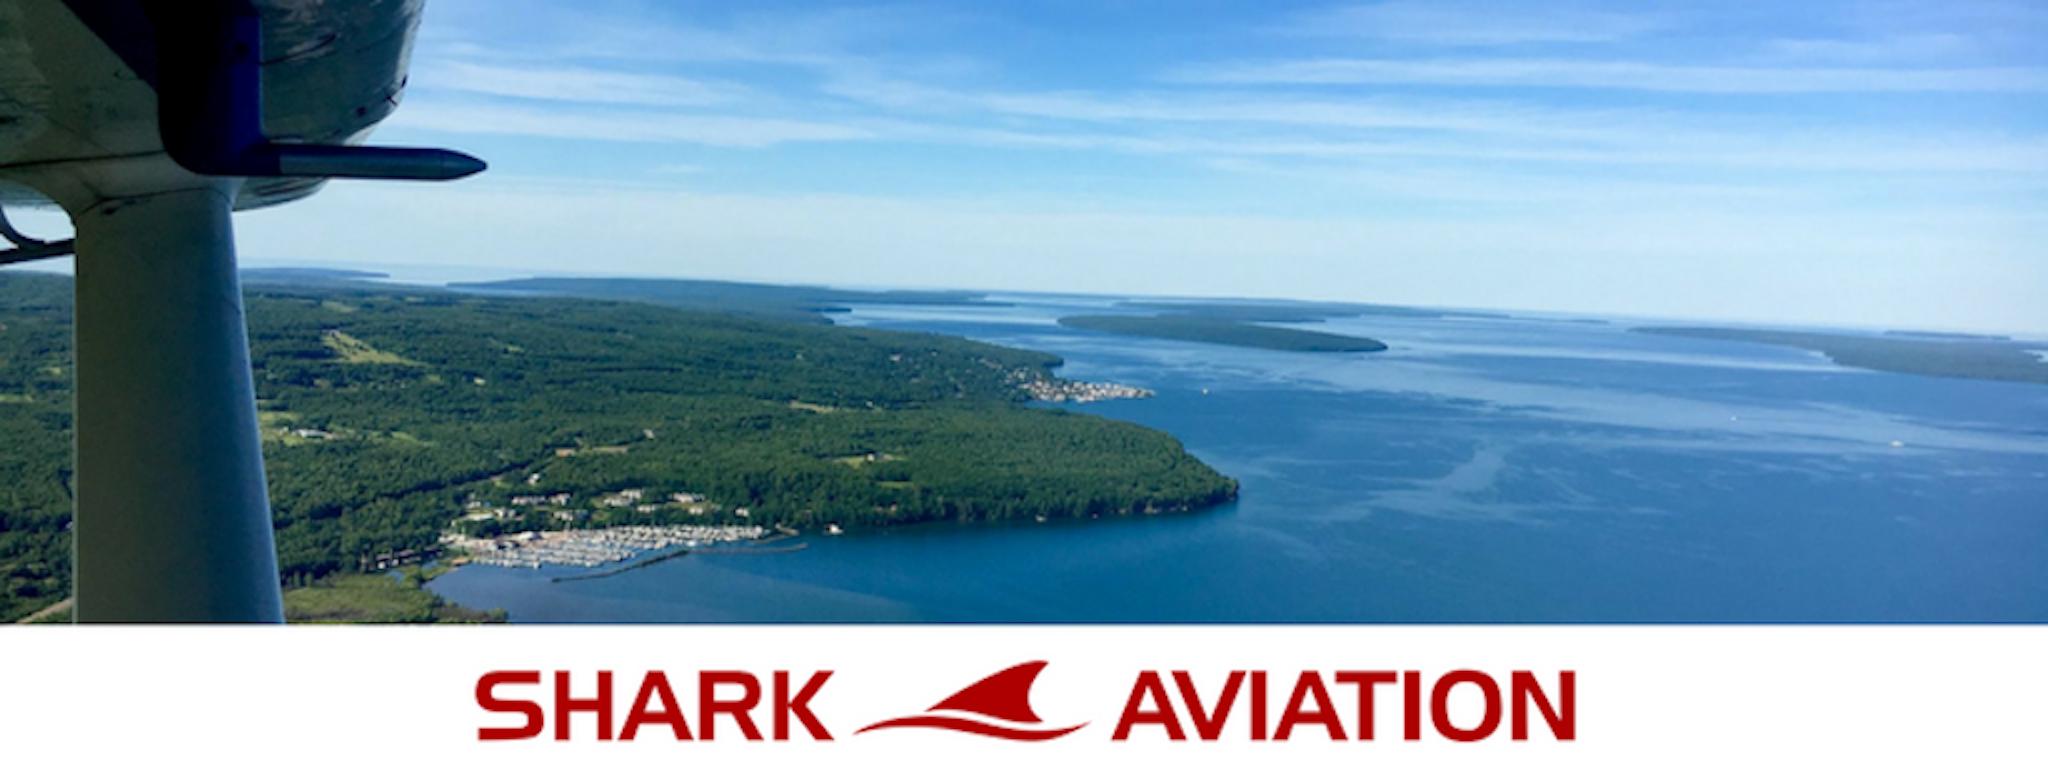 Shark-Aviation-Seplane-tours